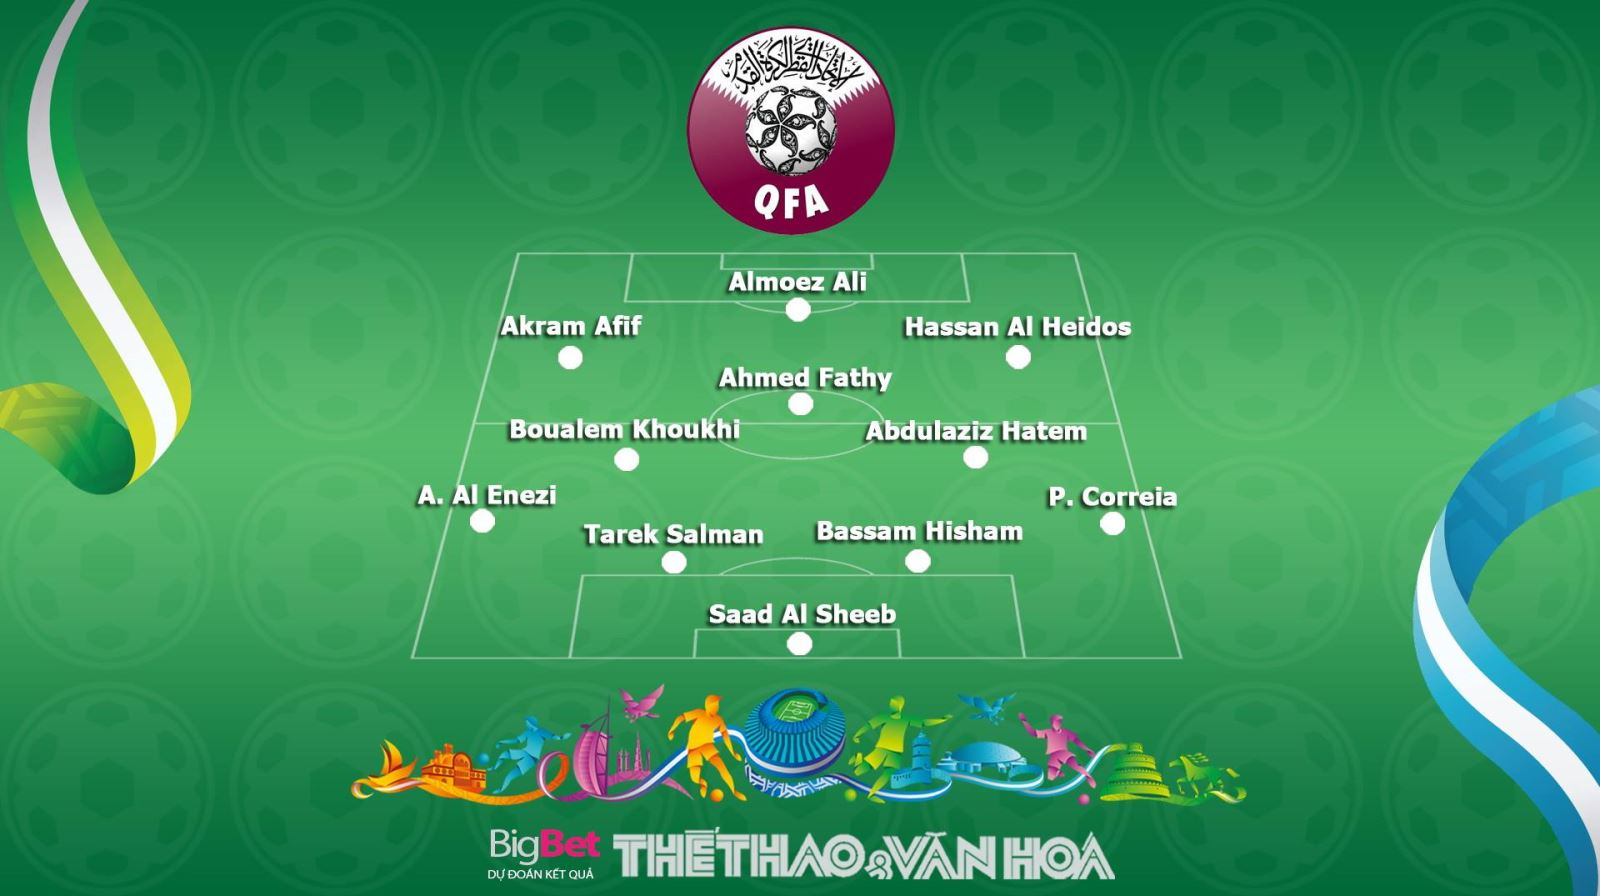 Hàn Quốc vs Qatar, Hanquoc vs Qatar, Han Quoc vs Qatar, Hàn Quốc và Qatar, Hàn Quốc với Qatar, Hàn Quốc đấu với Qatar, Hàn Quốc gặp Qatar, HQ vs Qatar, HQ và Qatar, Hàn Quốc, HQ, Hanquoc, Han Quoc, Qatar